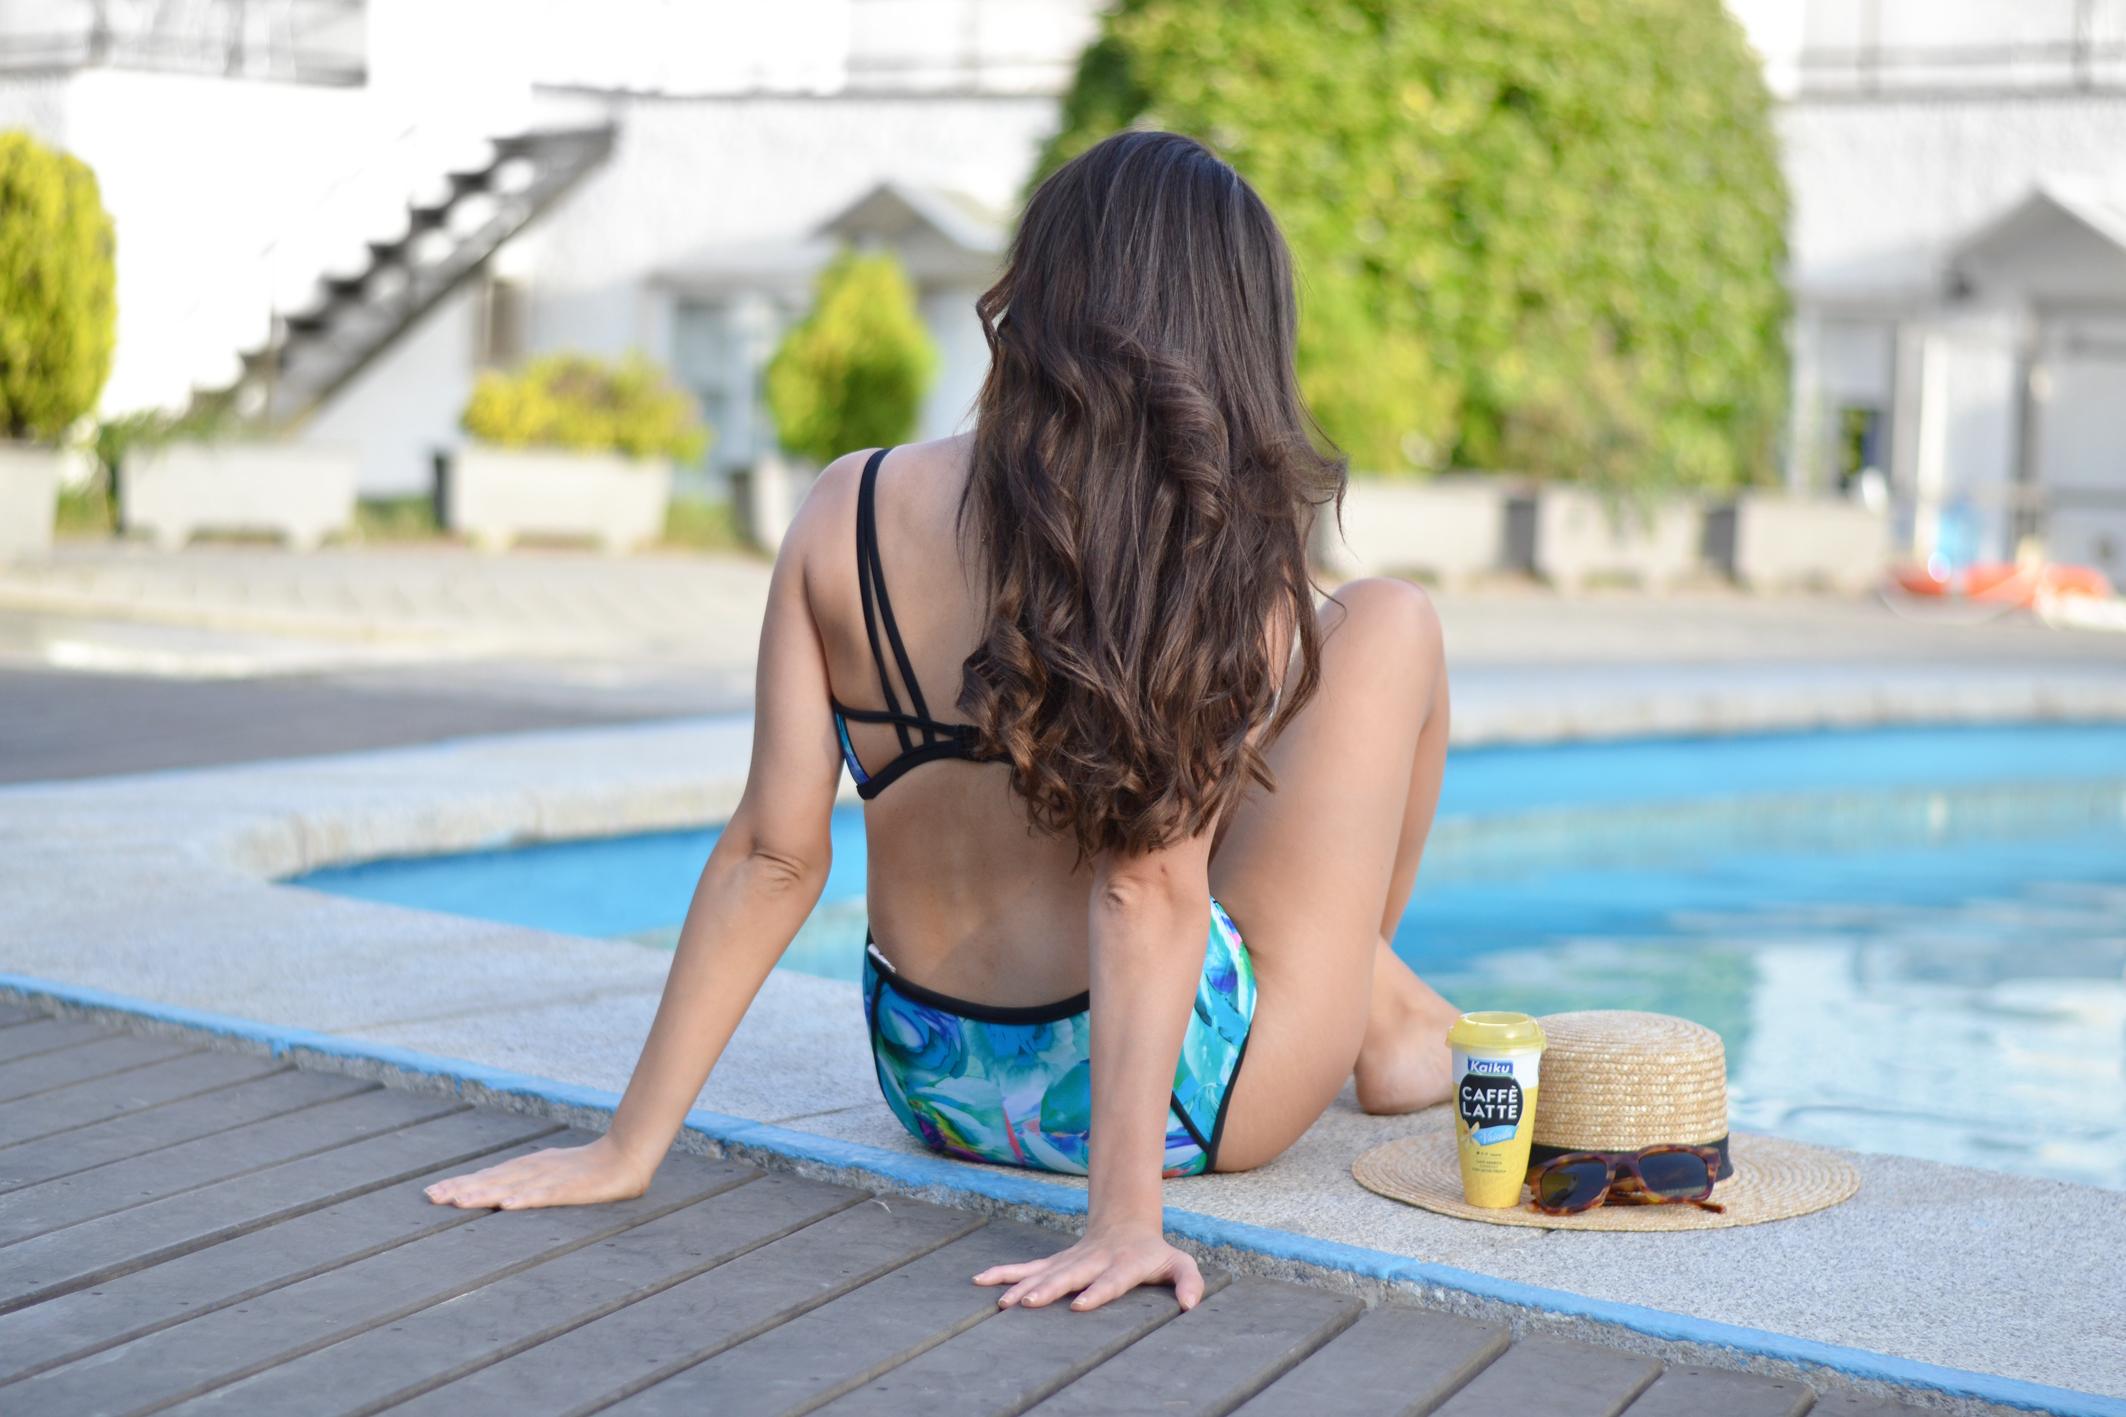 Swimwear, Dolores Cortes, retro high waist bikini, summer outfit, street style swimingpool